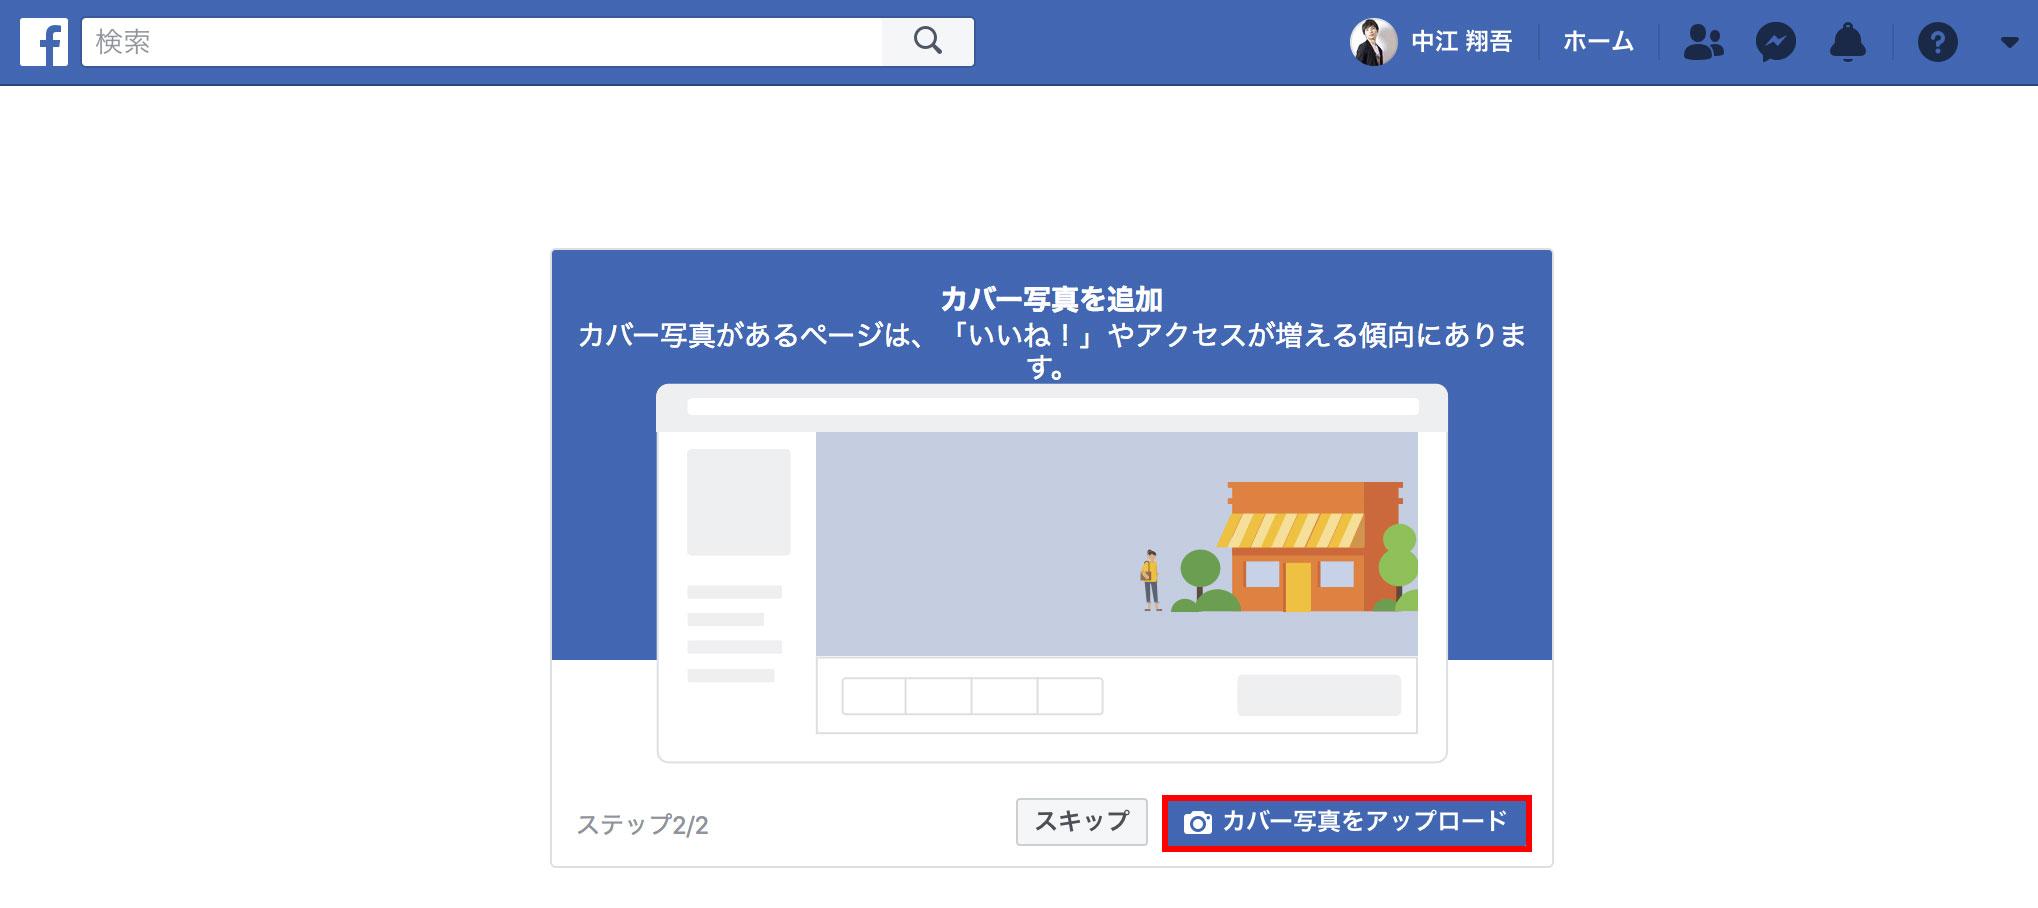 Facebookページのカバー画像を追加